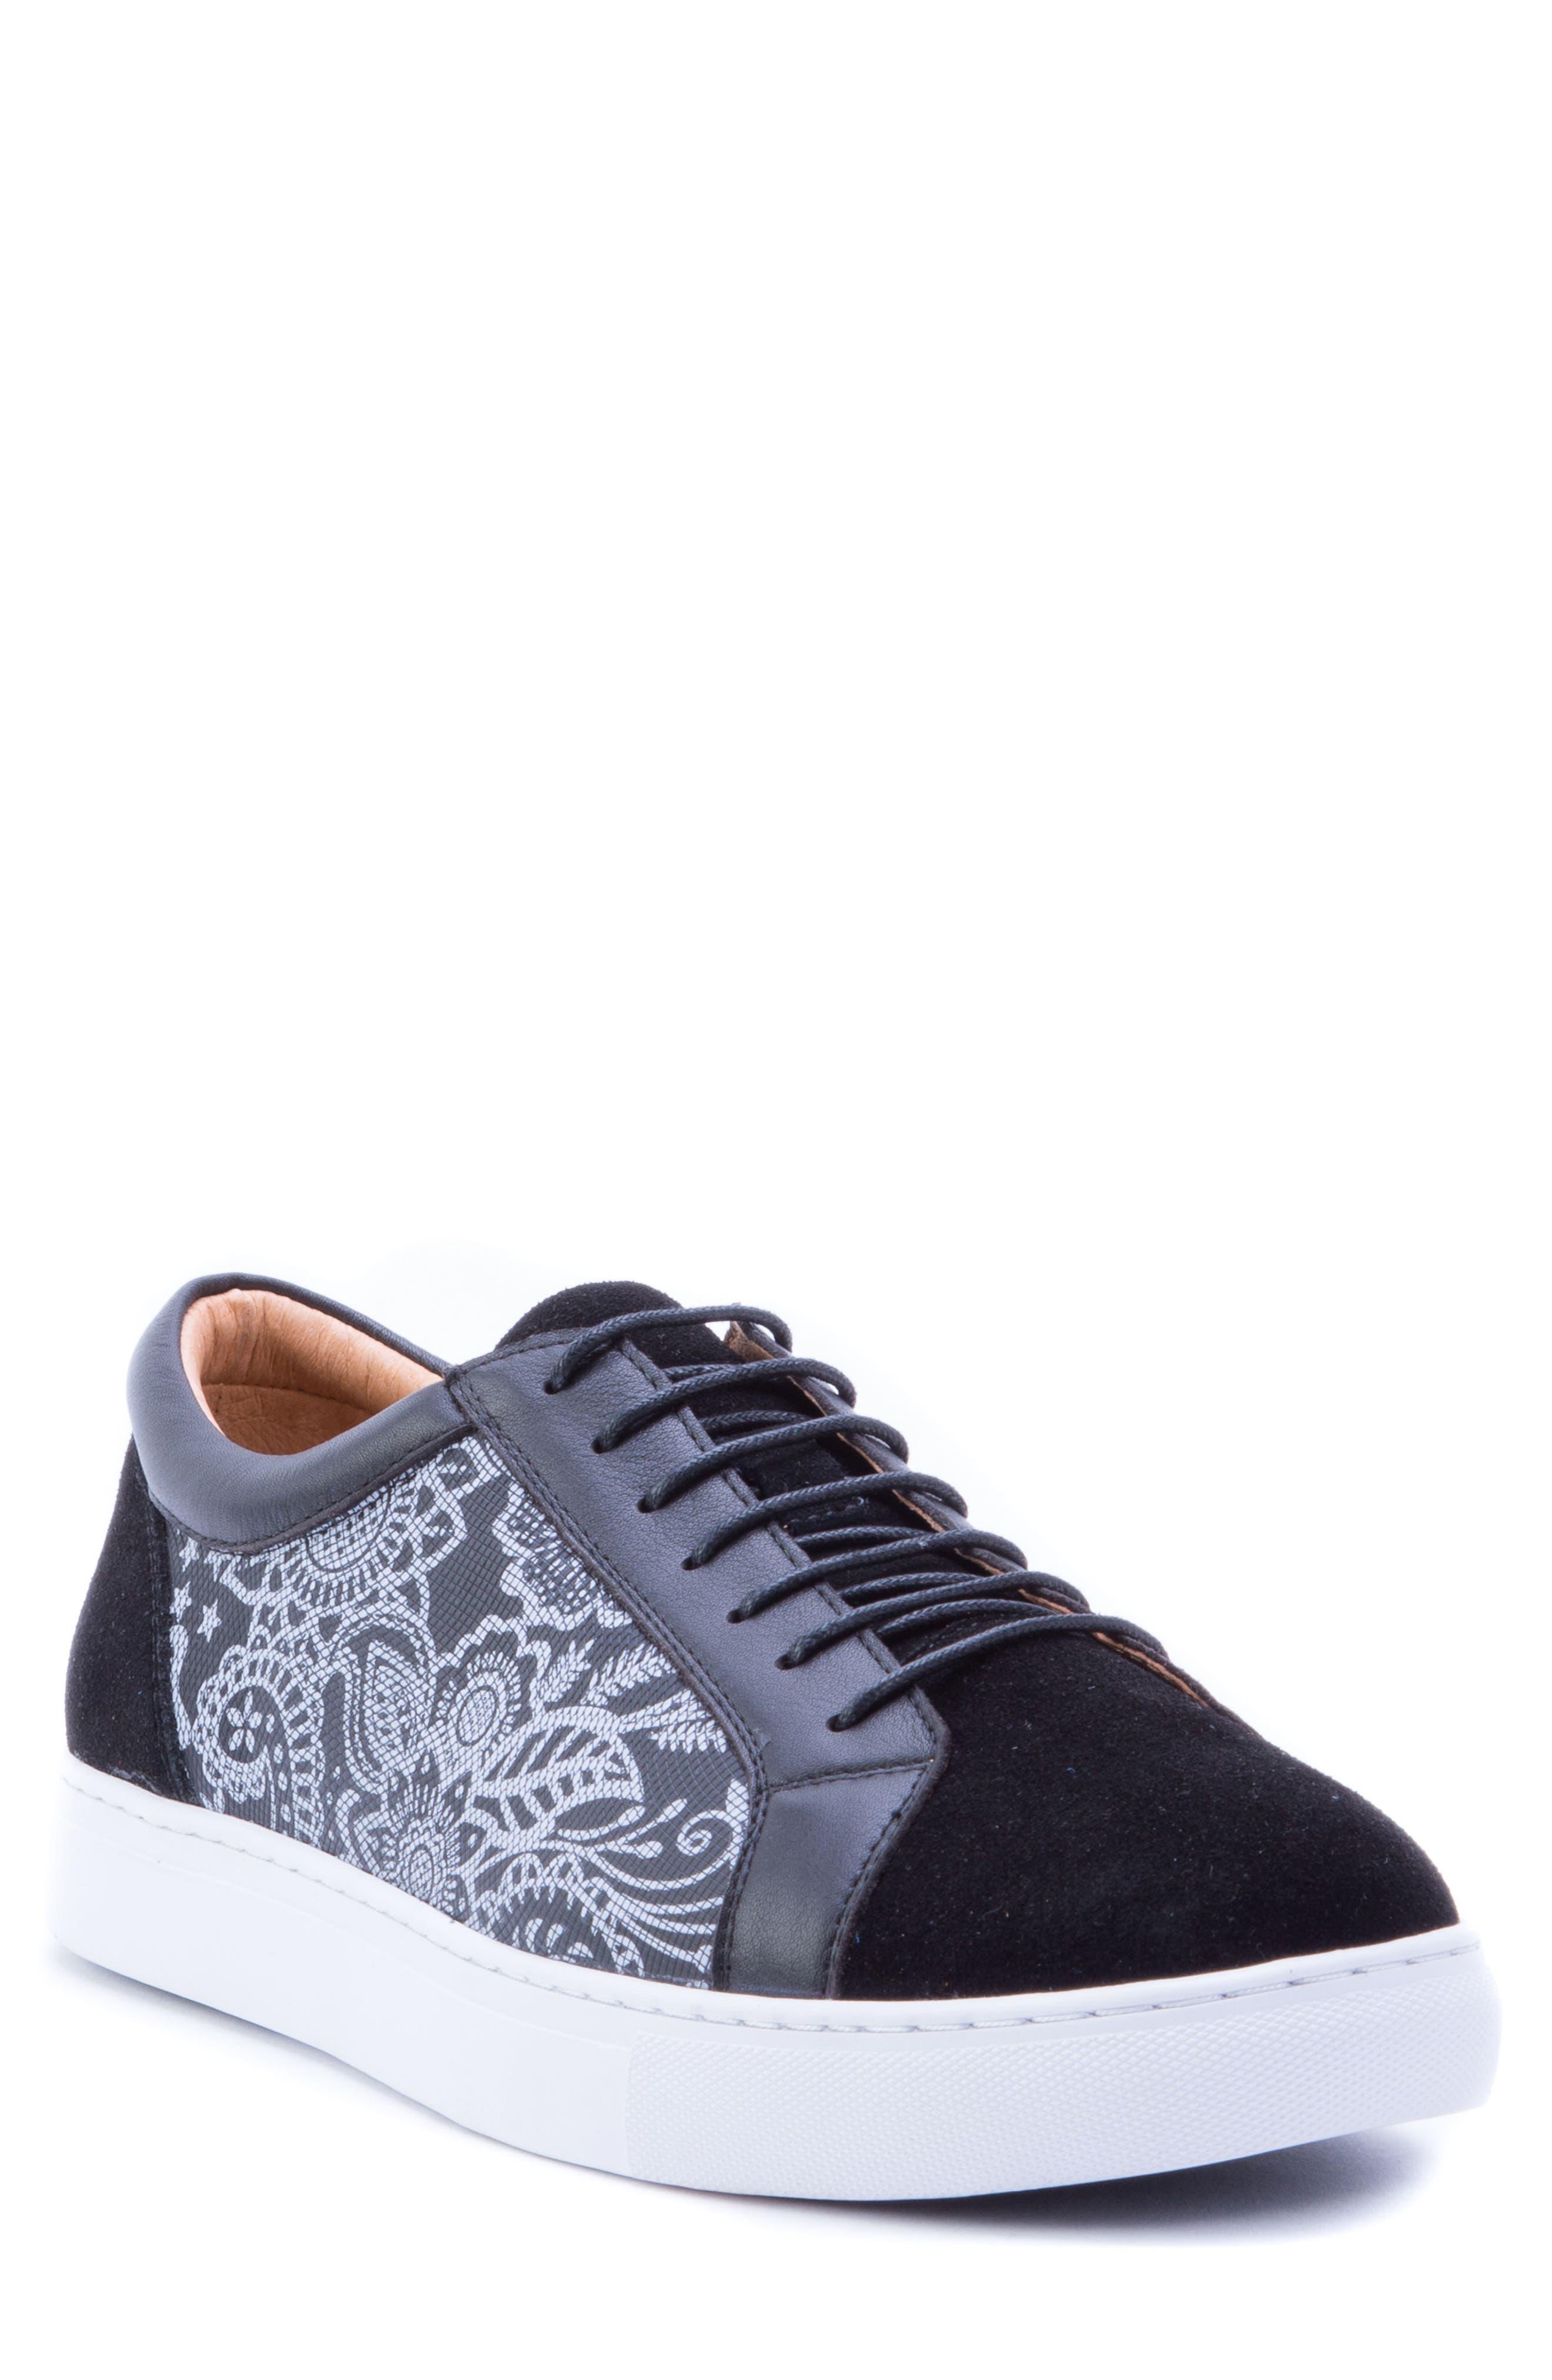 Robert Graham Rubio Floral Sneaker- Black